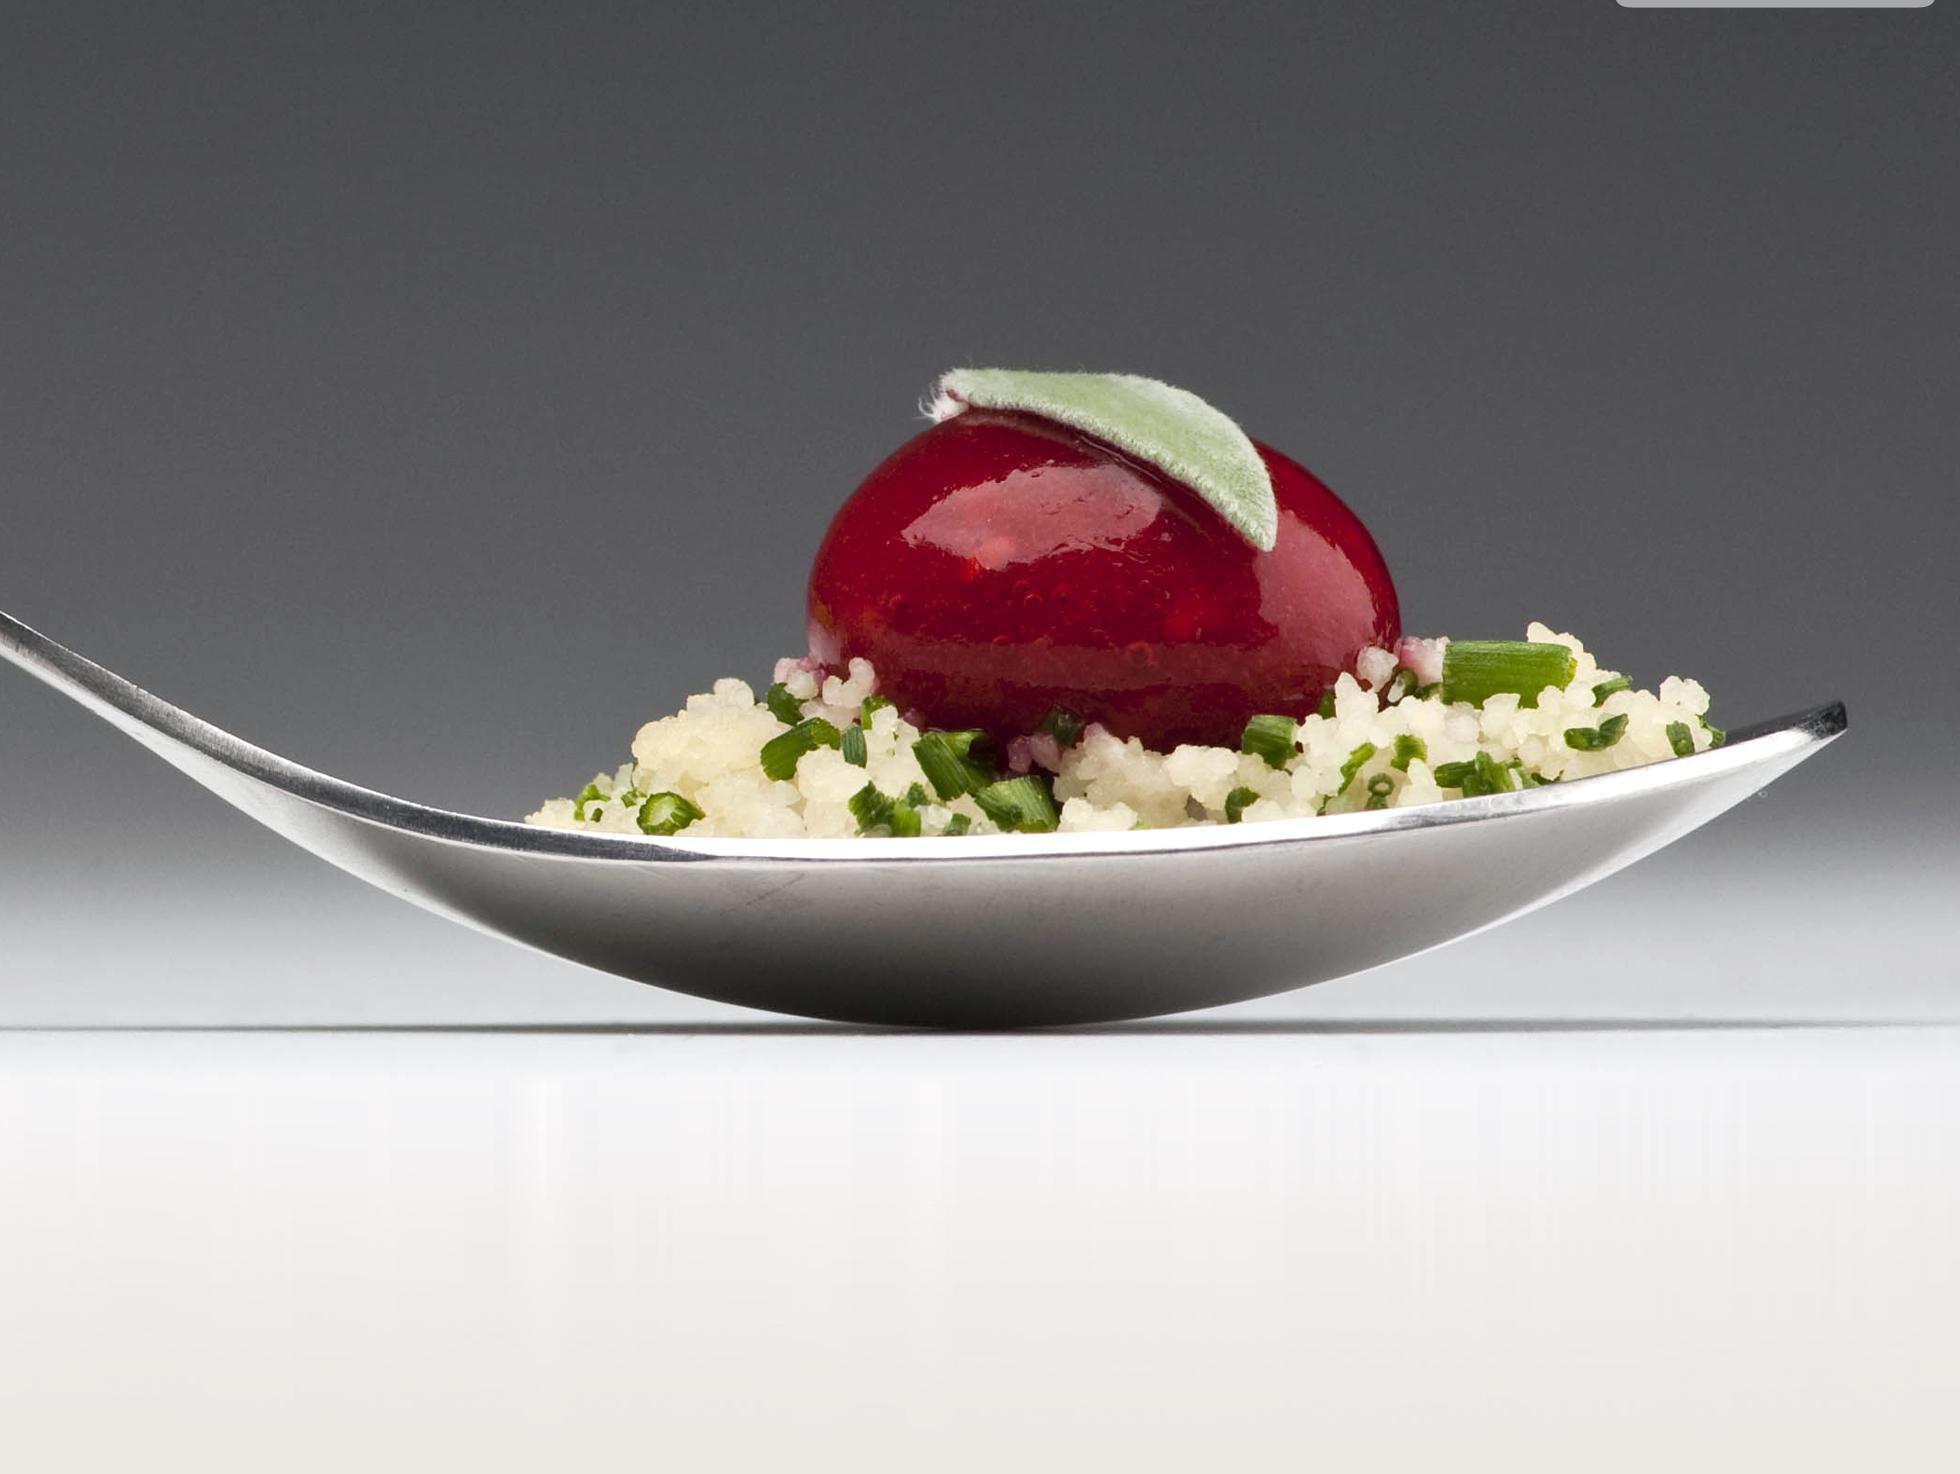 Cuisine R-Evolution   Molecular gastronomy, Cuisine and Tzatziki